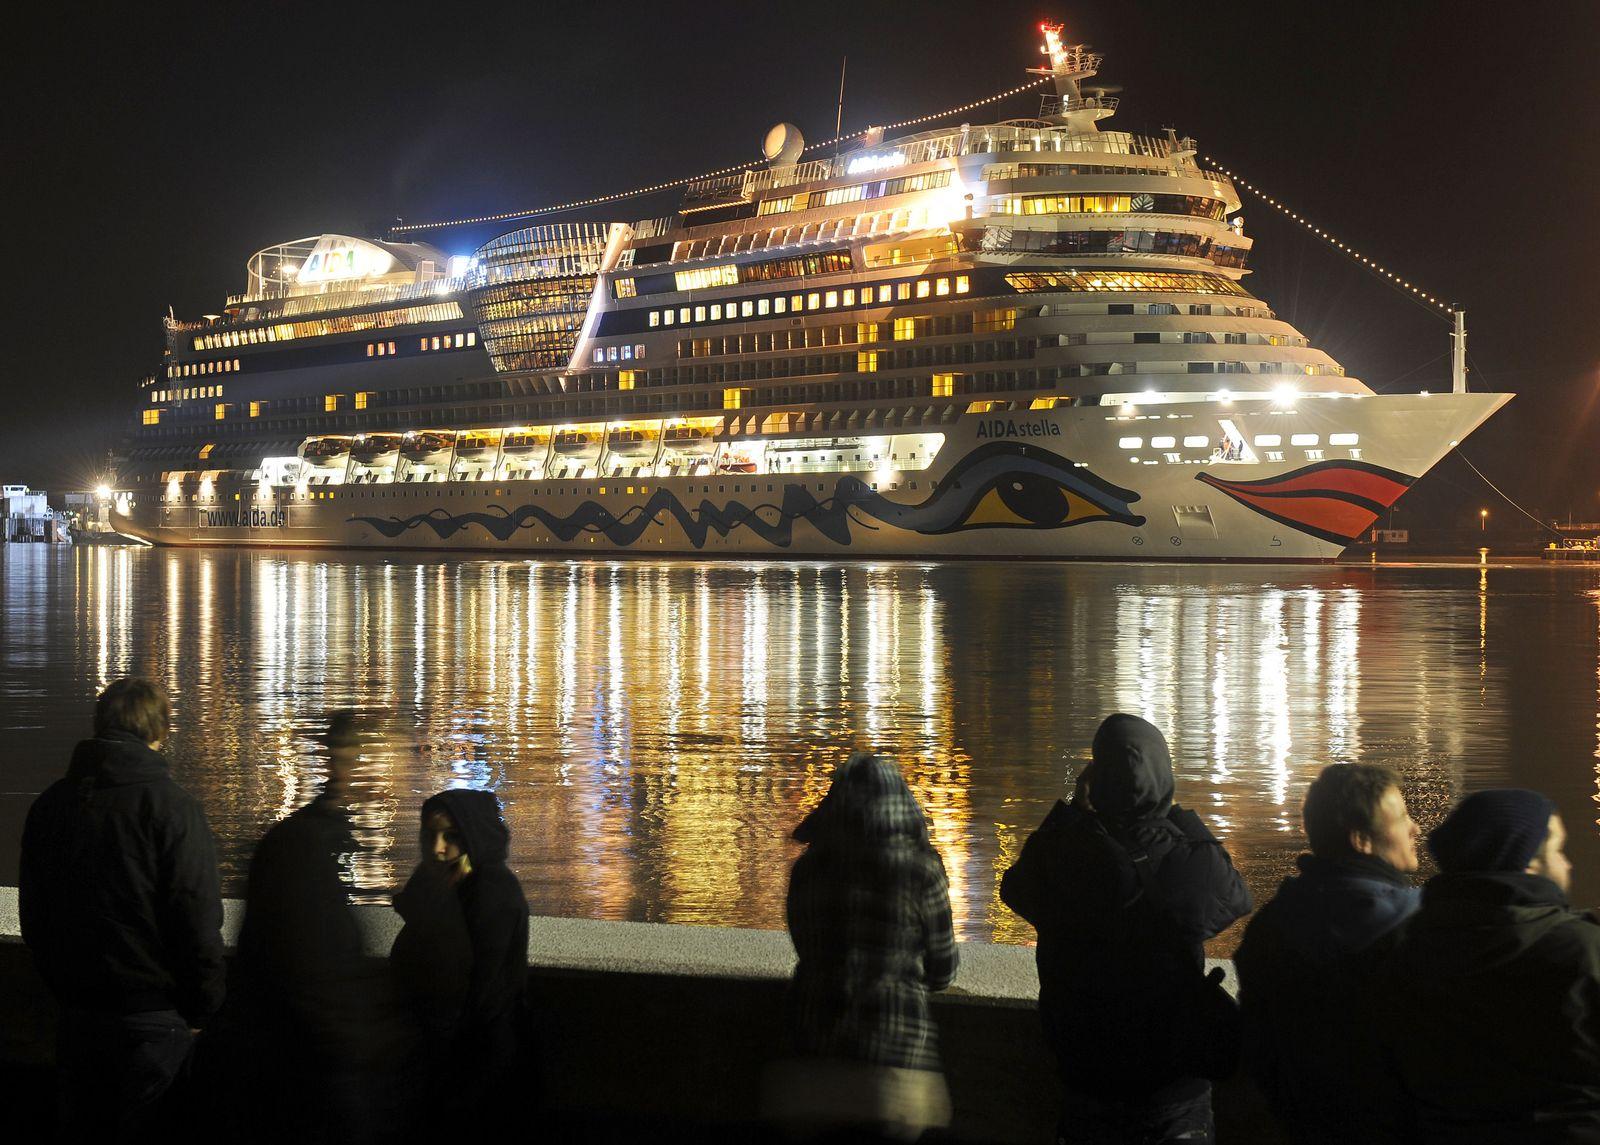 Aida Cruises sagt Türkei-Routen ab